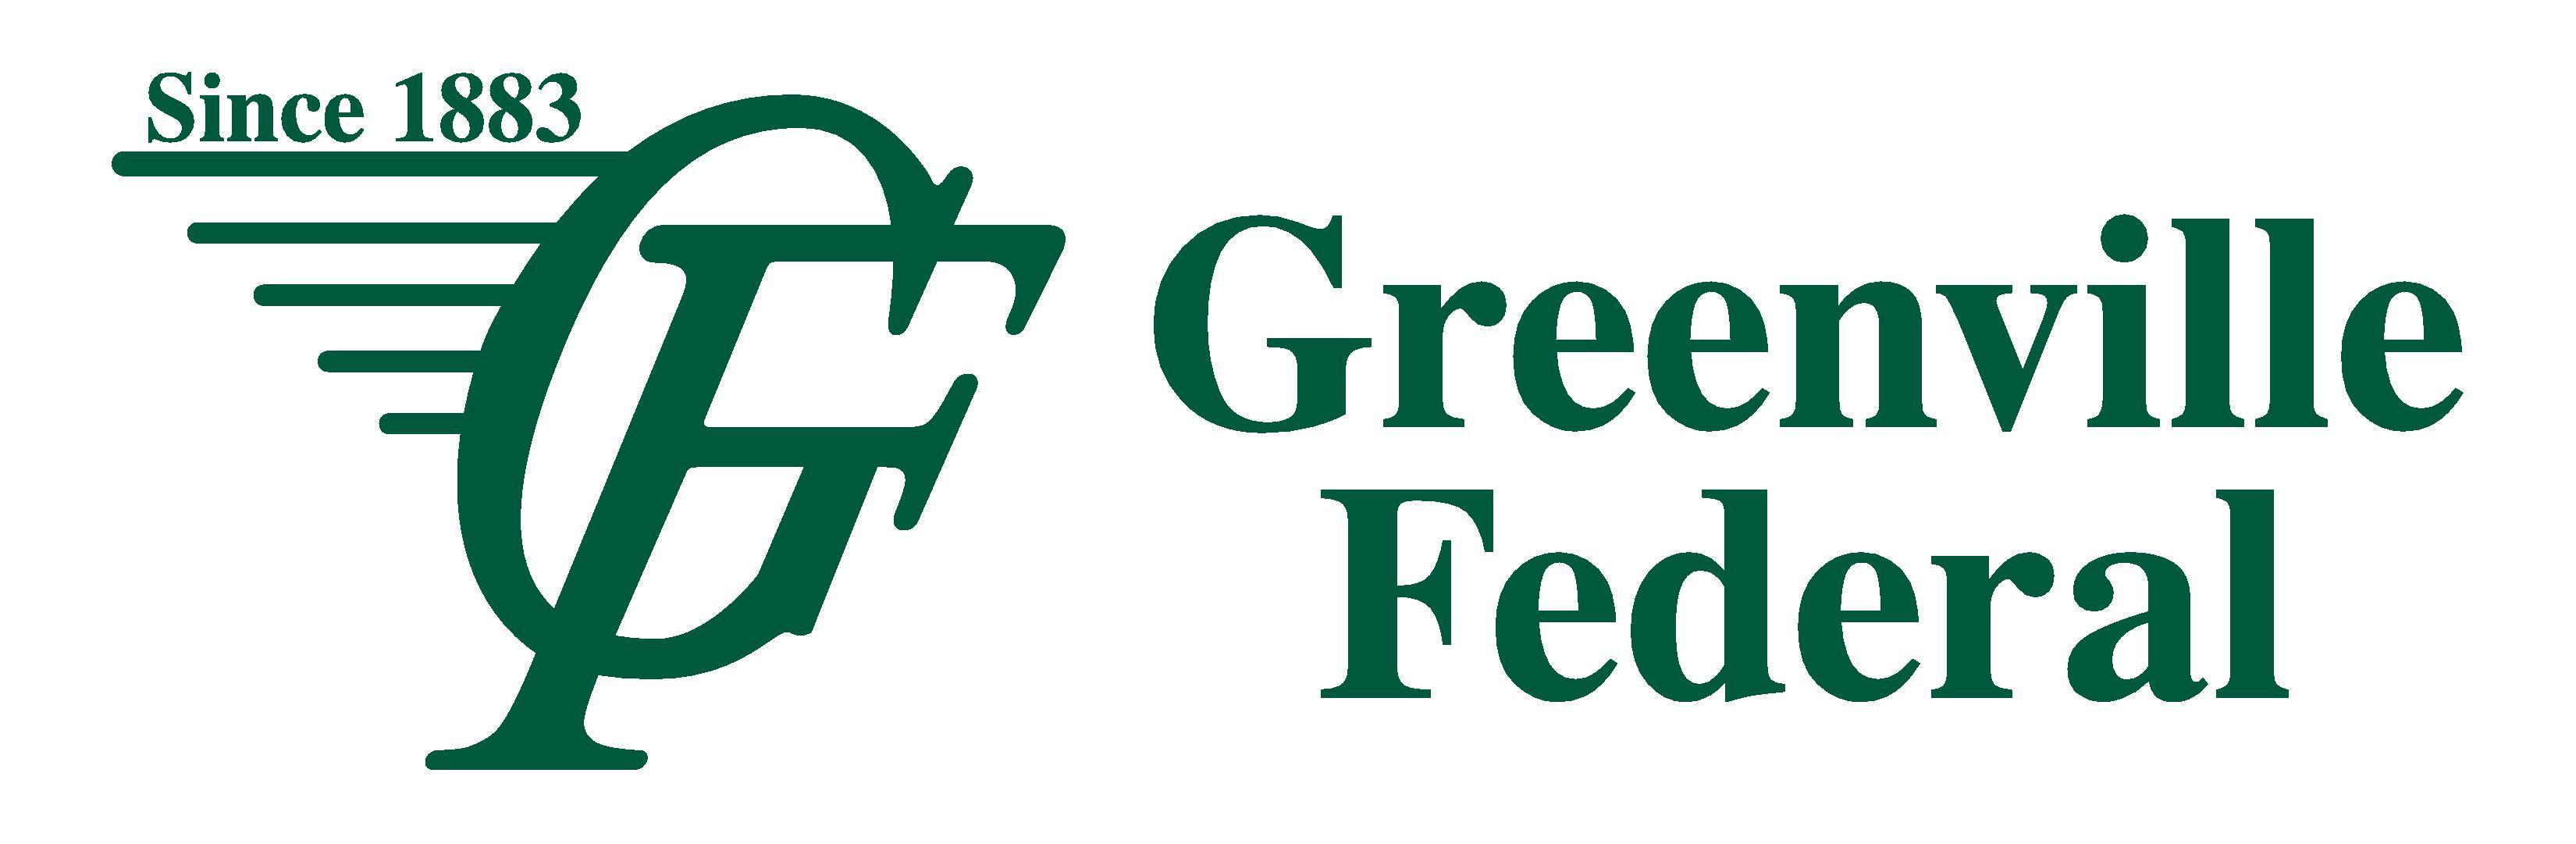 Greenville Federal logo